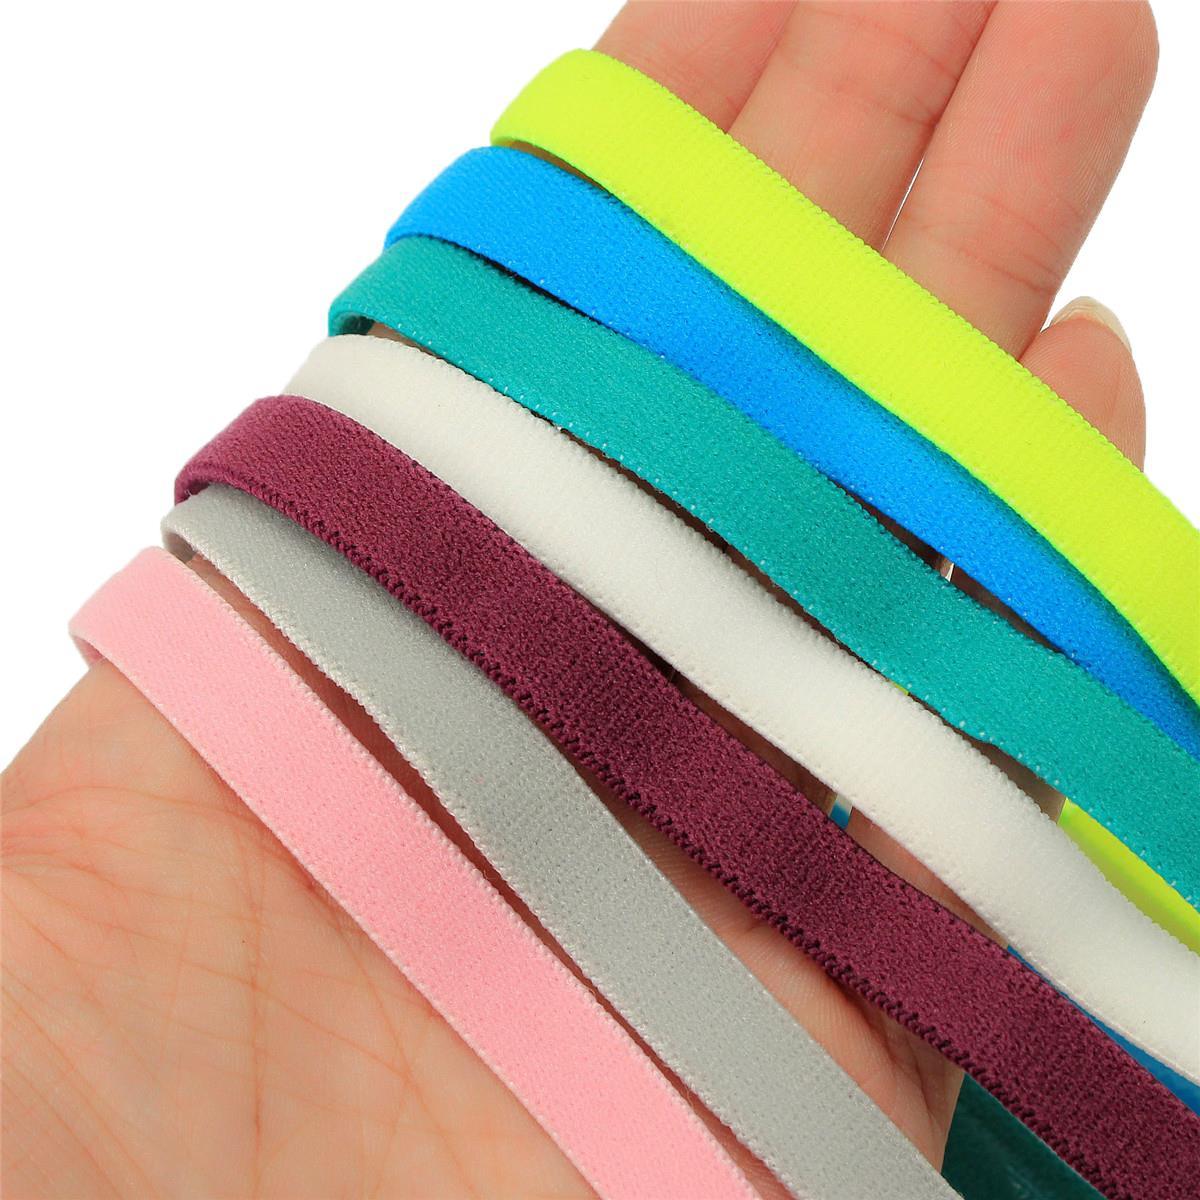 2015 High Quality Men&Women Hair Accessories Yoga Sports Unisex Stretch Headband Girl Hair Rope Elastic Band Headwear 10 Colors(China (Mainland))